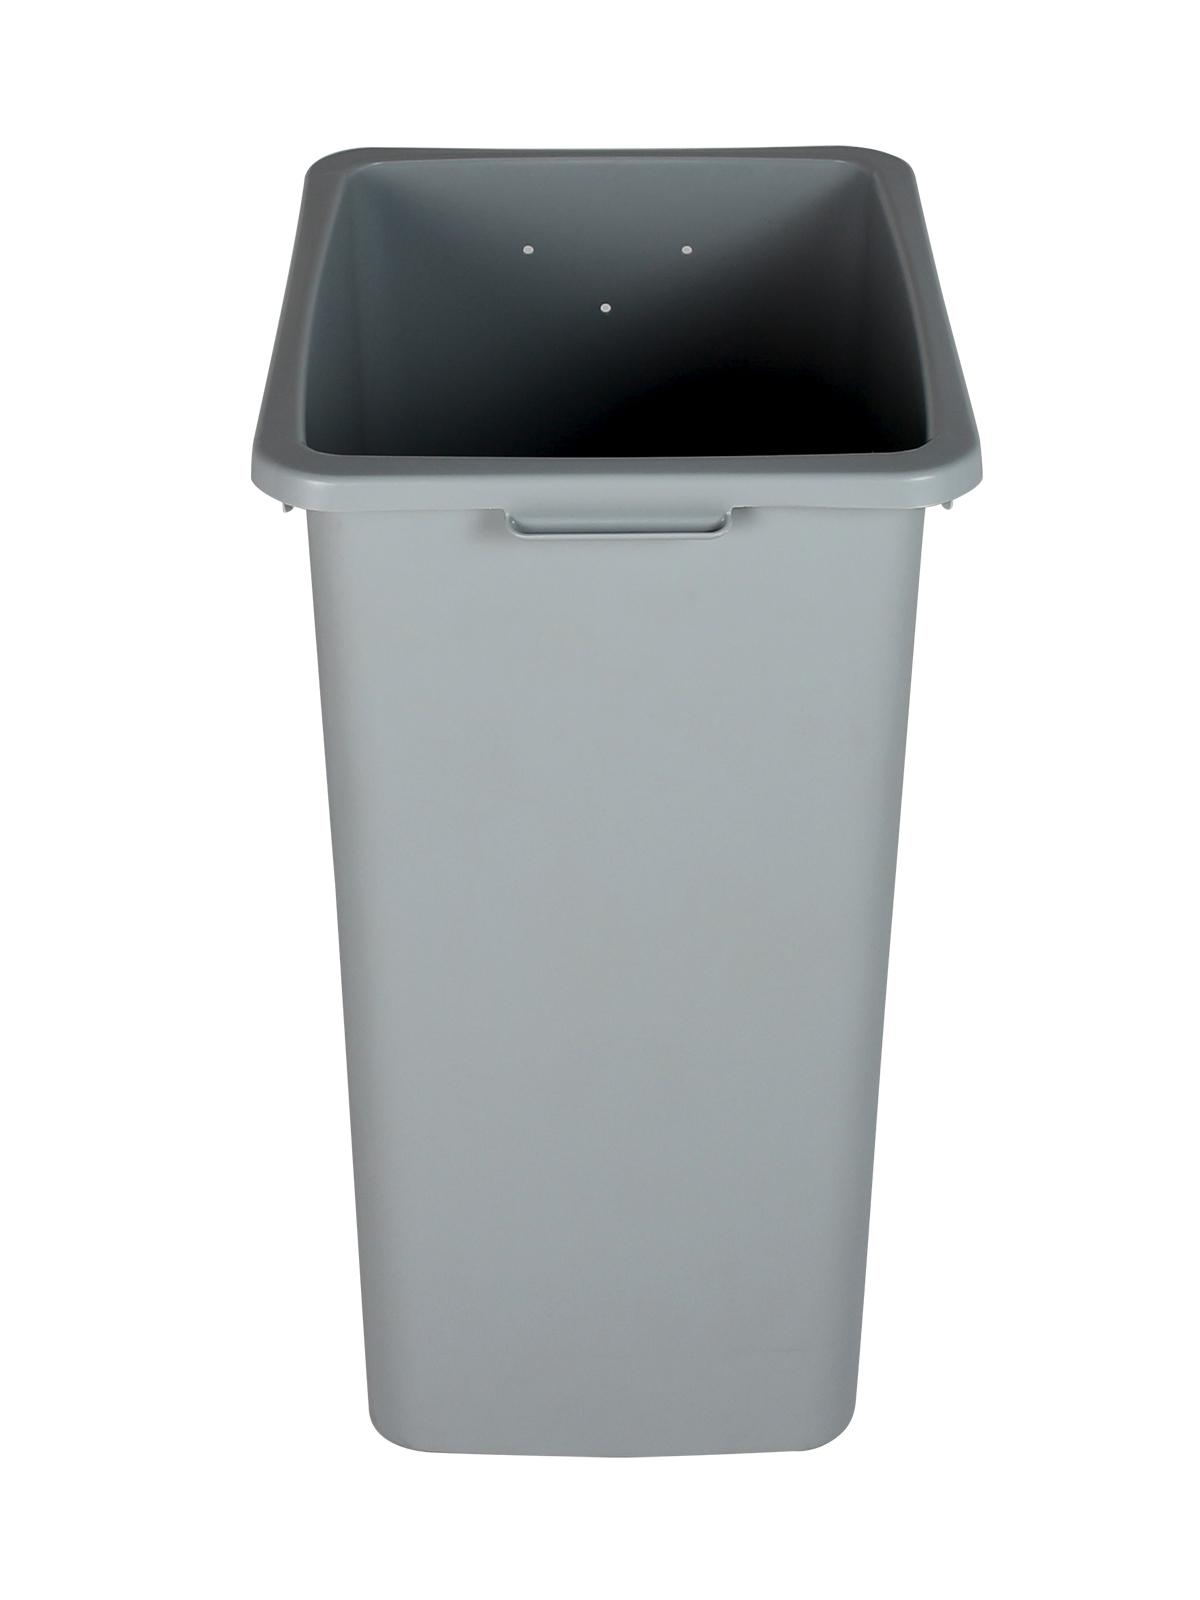 WASTE WATCHER XL - Single - Body - 27 - Executive Grey